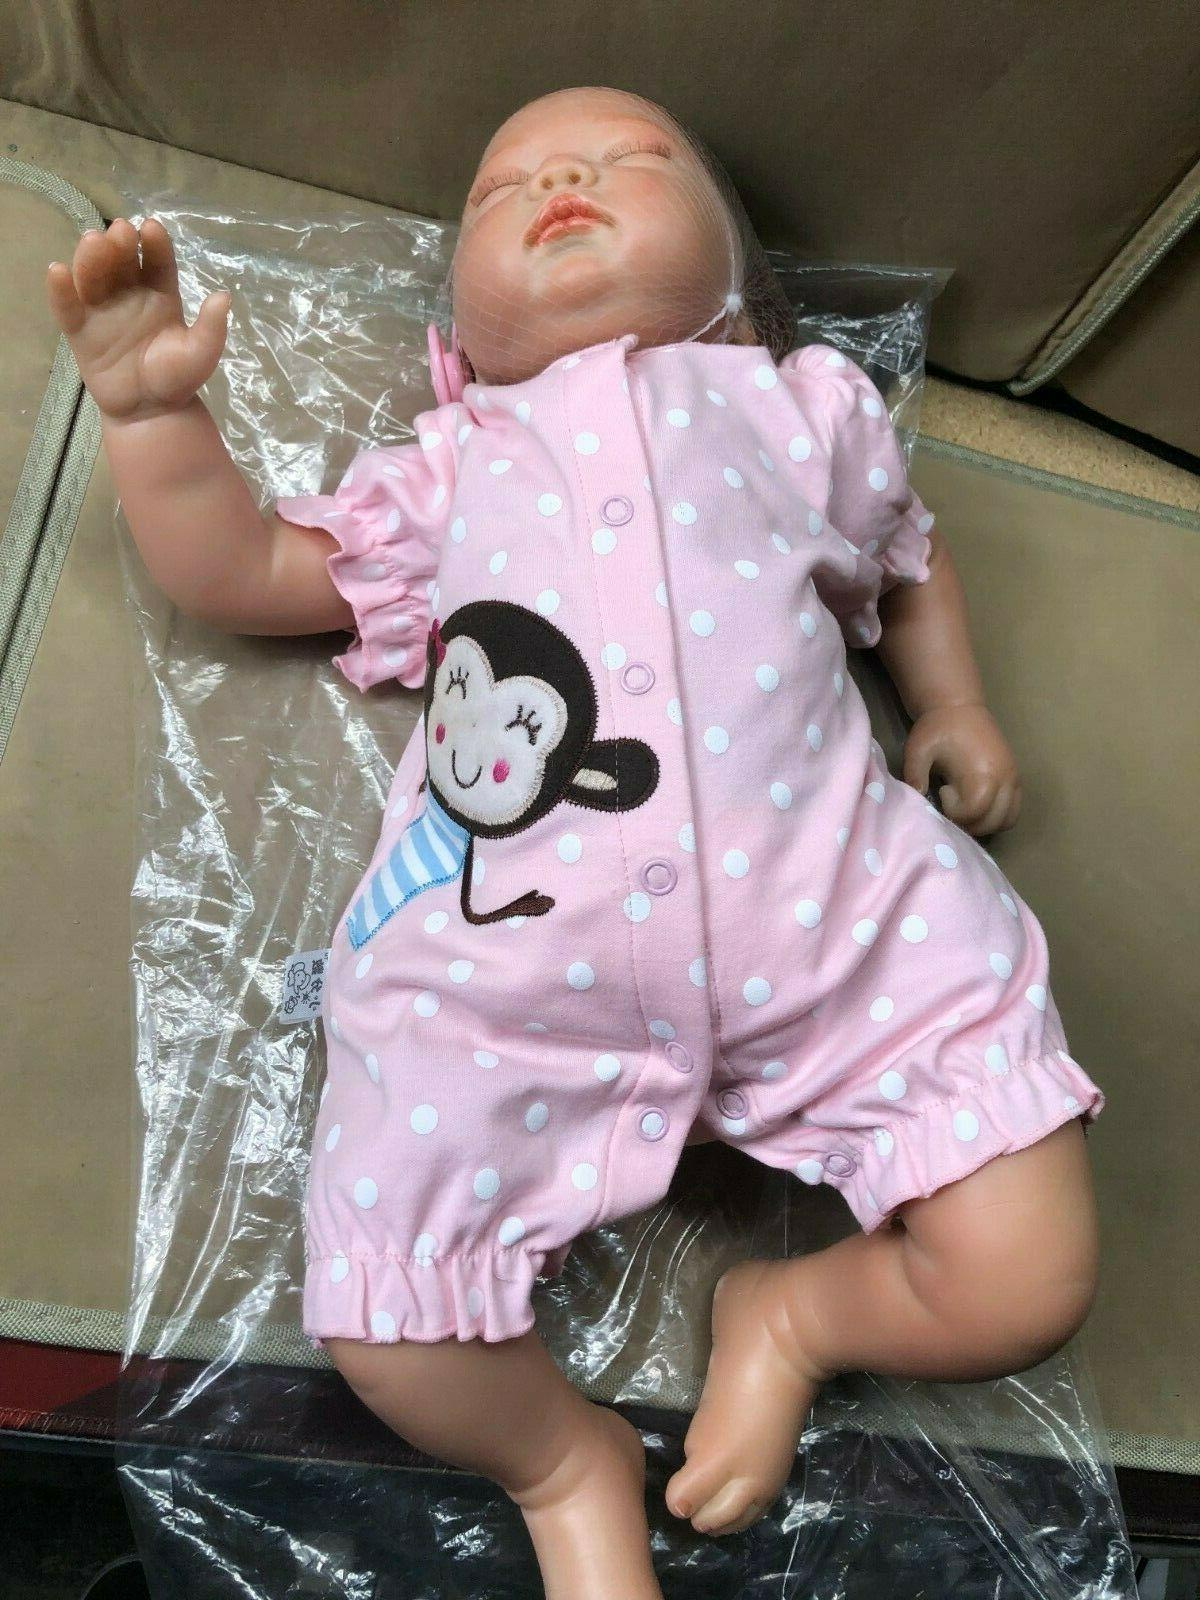 reborn baby gentle real look doll 20